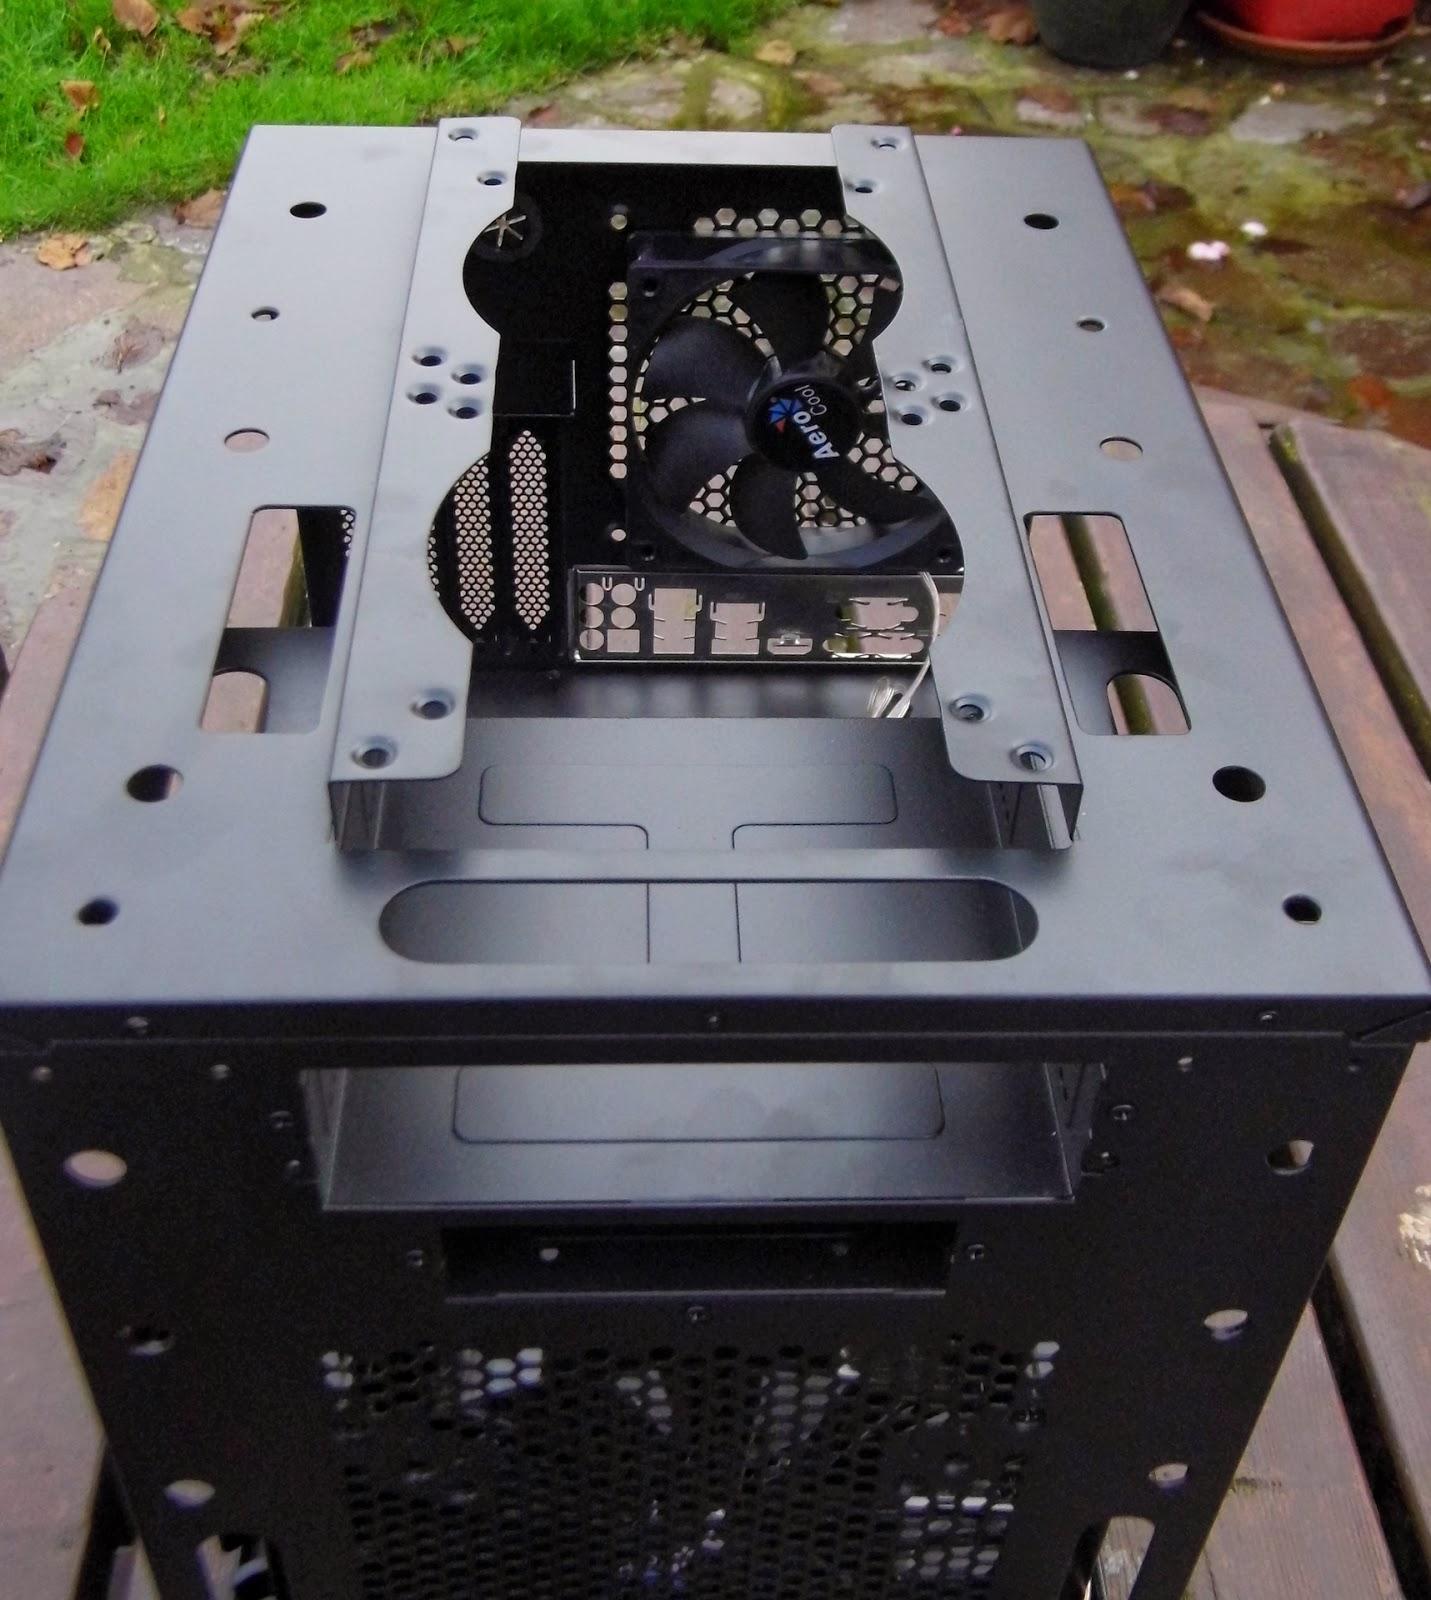 la-centrale-du-hardware-test-boitier-aerocol-ds-dead-silence-cube-top